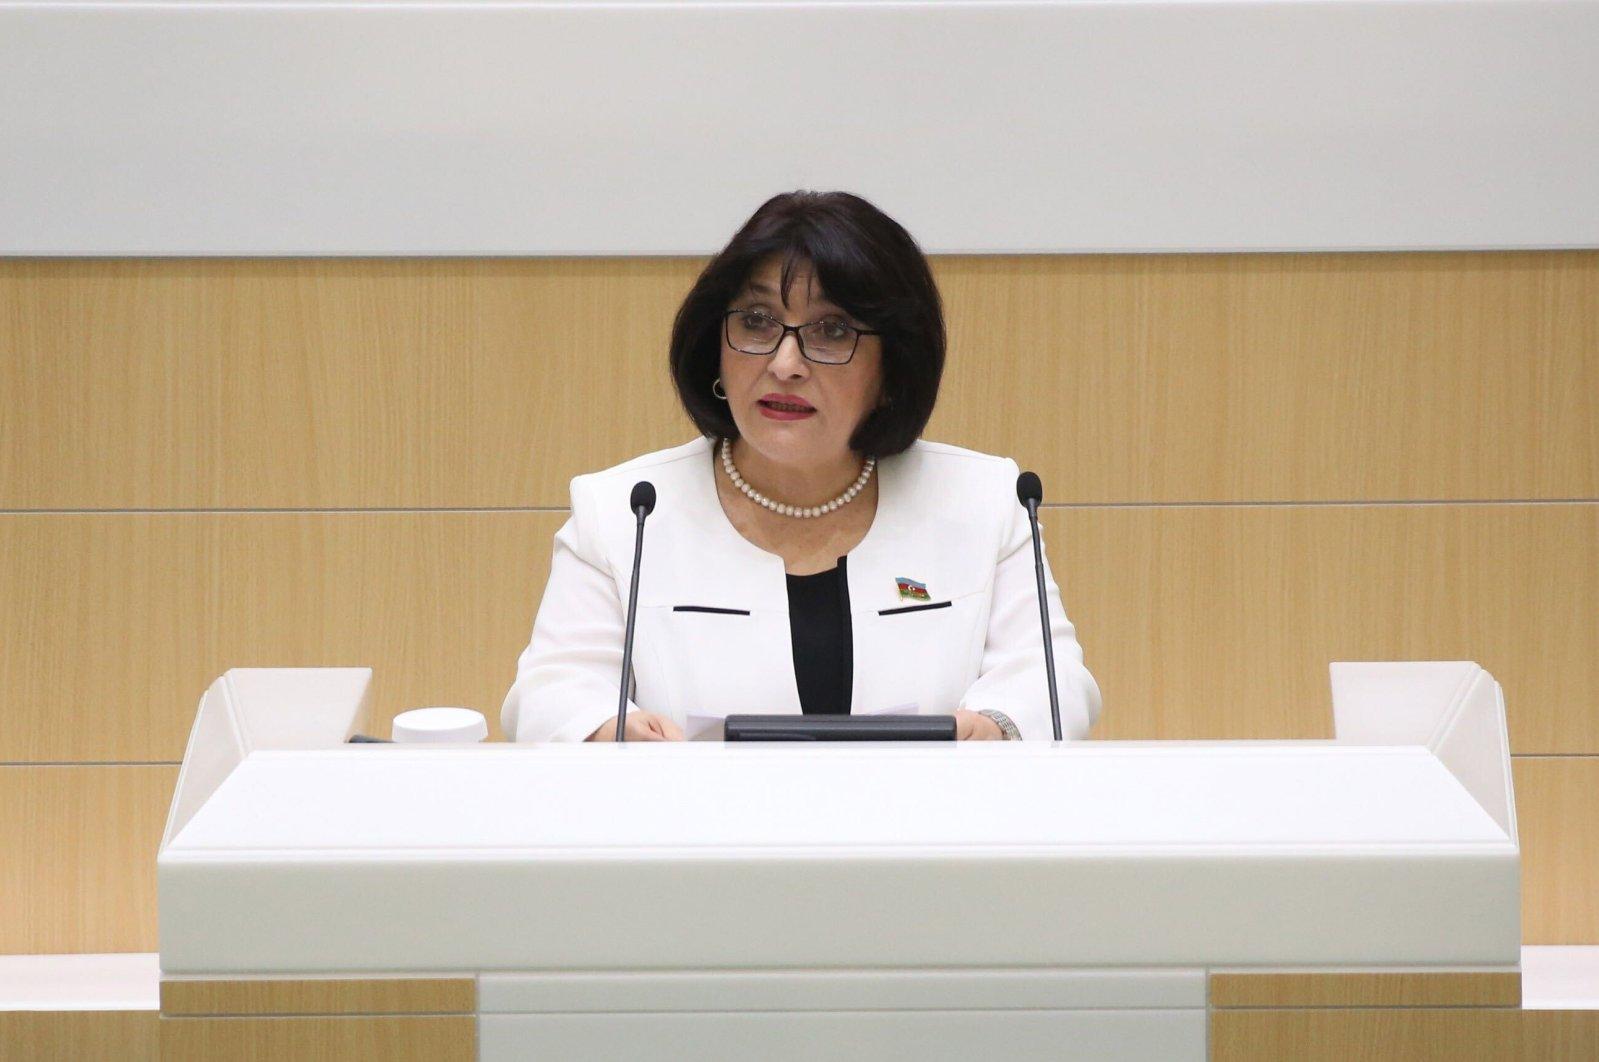 Azerbaijan's Parliament Speaker Sahibe Gafarova speaking at a session in Baku, Azerbaijan (Courtesy of the Azerbaijani Parliament)